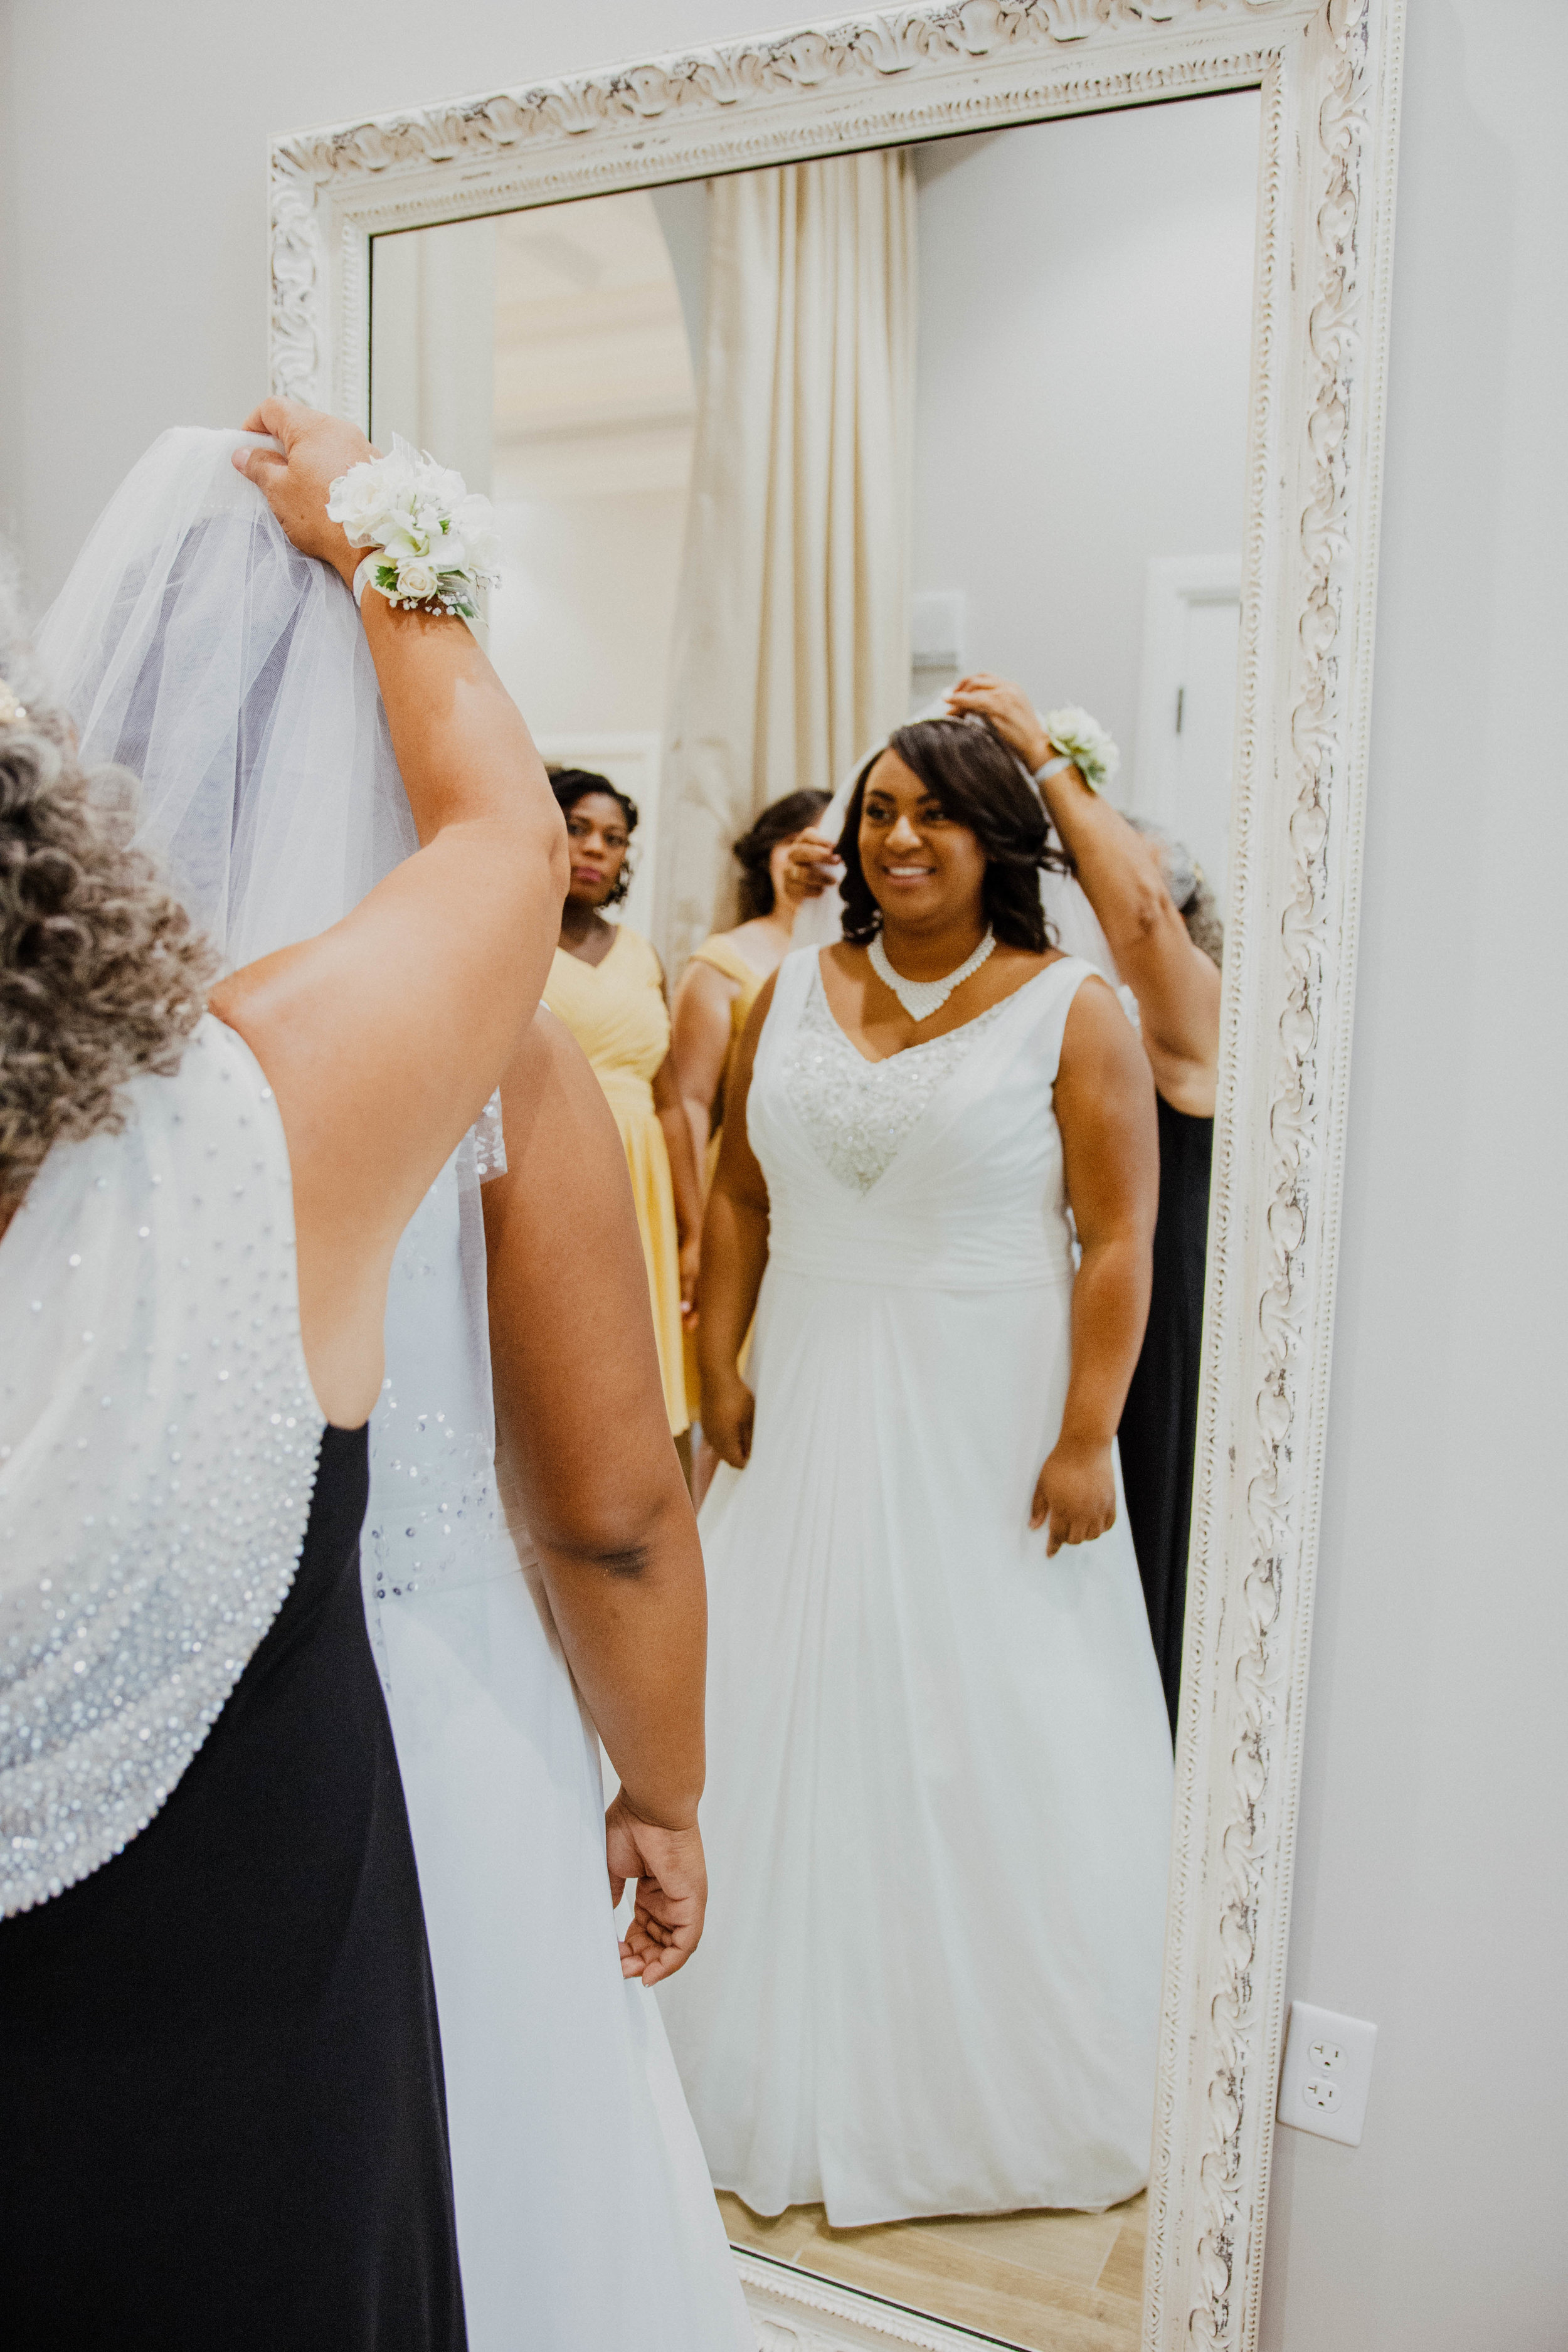 McNeile_Photography_Wedding_Tampa10.jpg